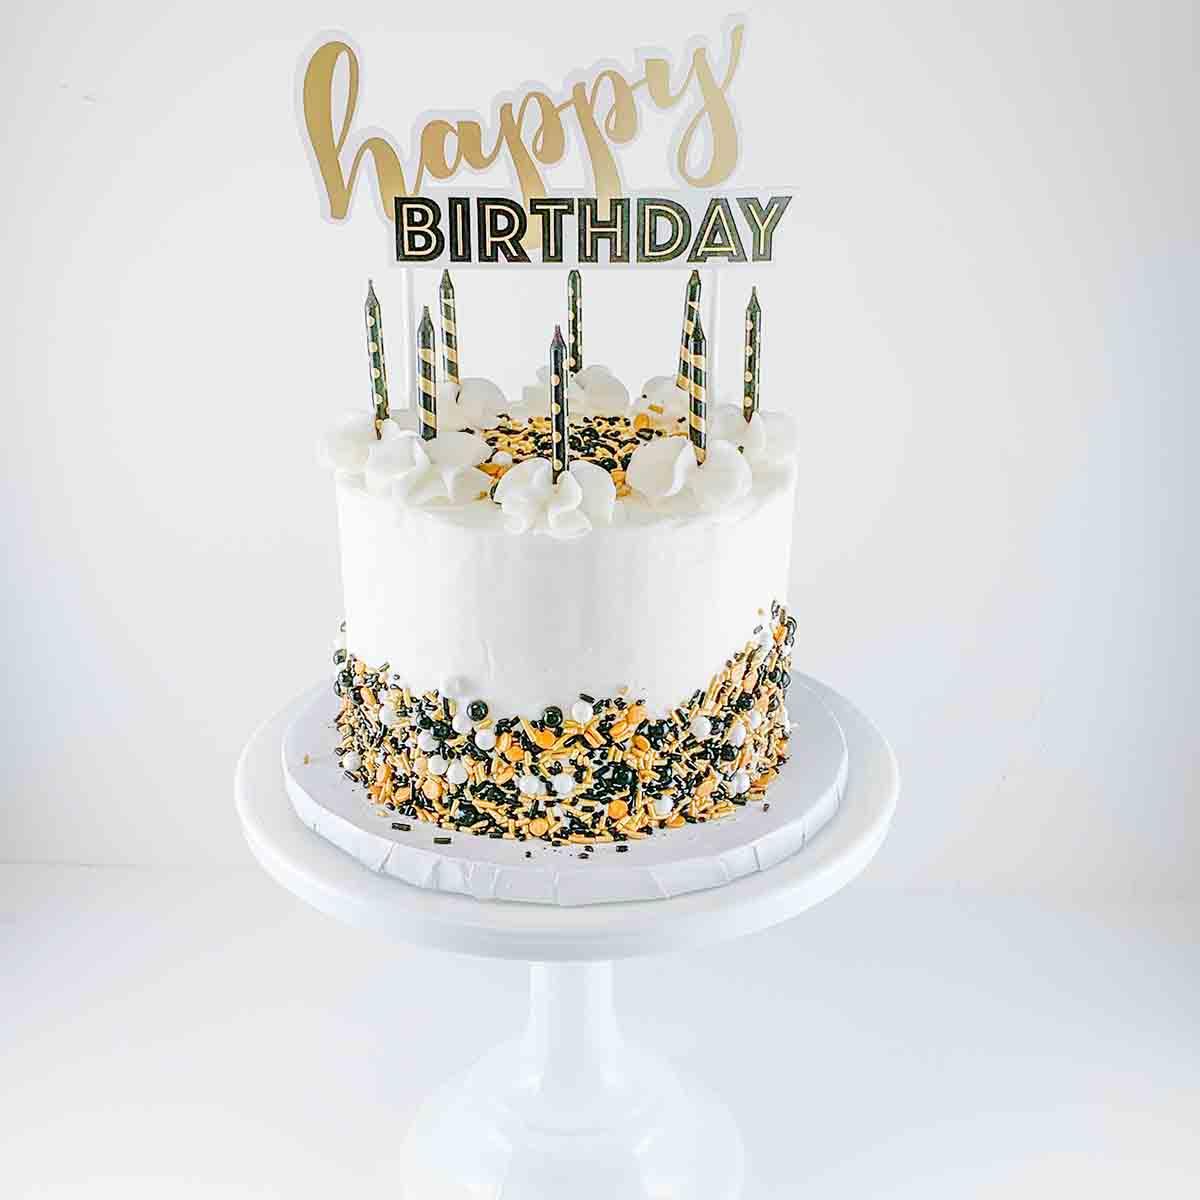 Bake at Home Gold and Black Birthday Cake Kit